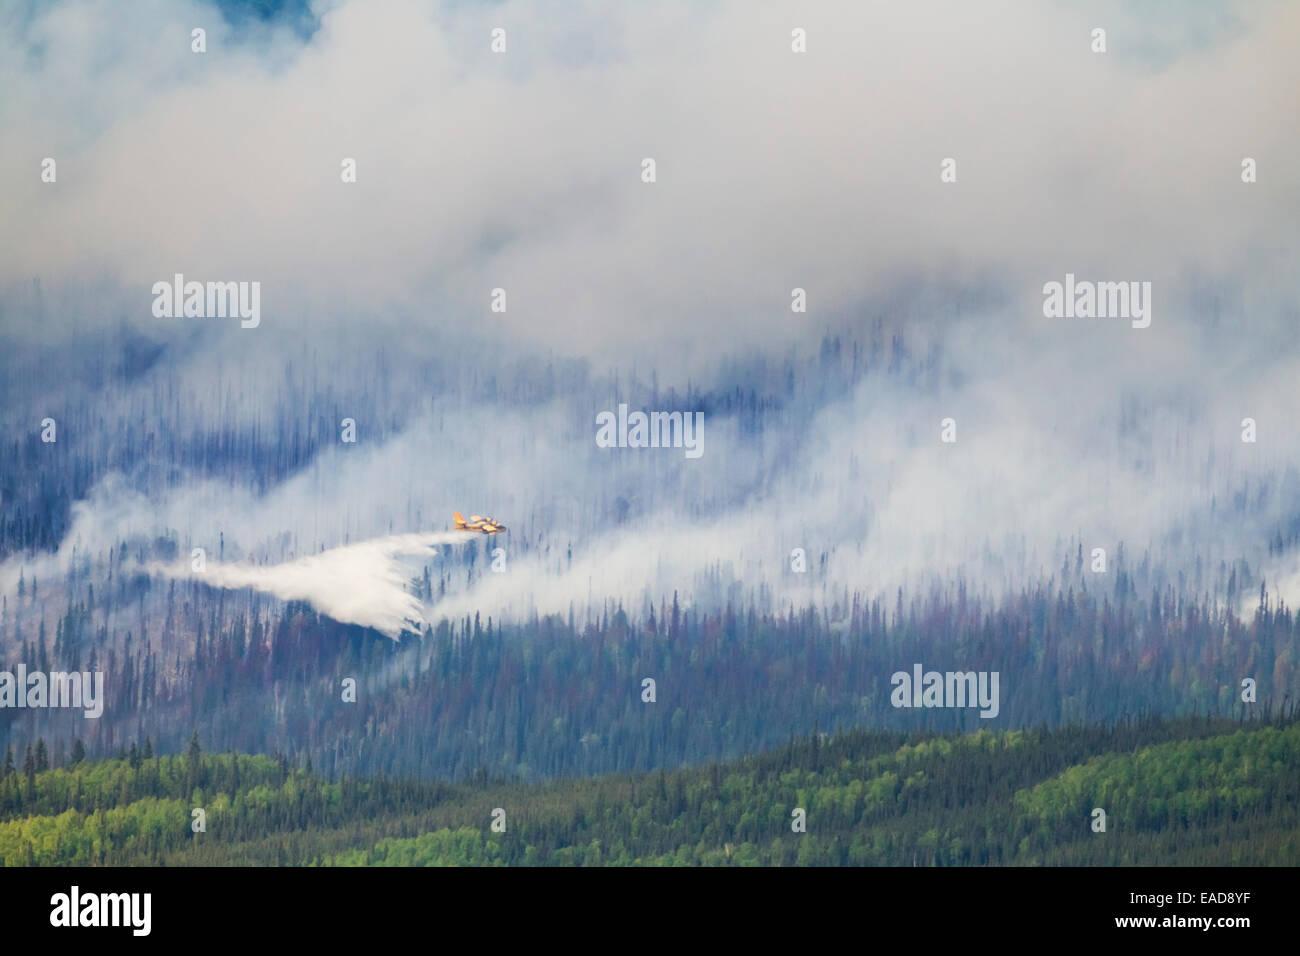 Rauch, Flugzeug, Brandbekämpfung, Waldbrand Stockbild